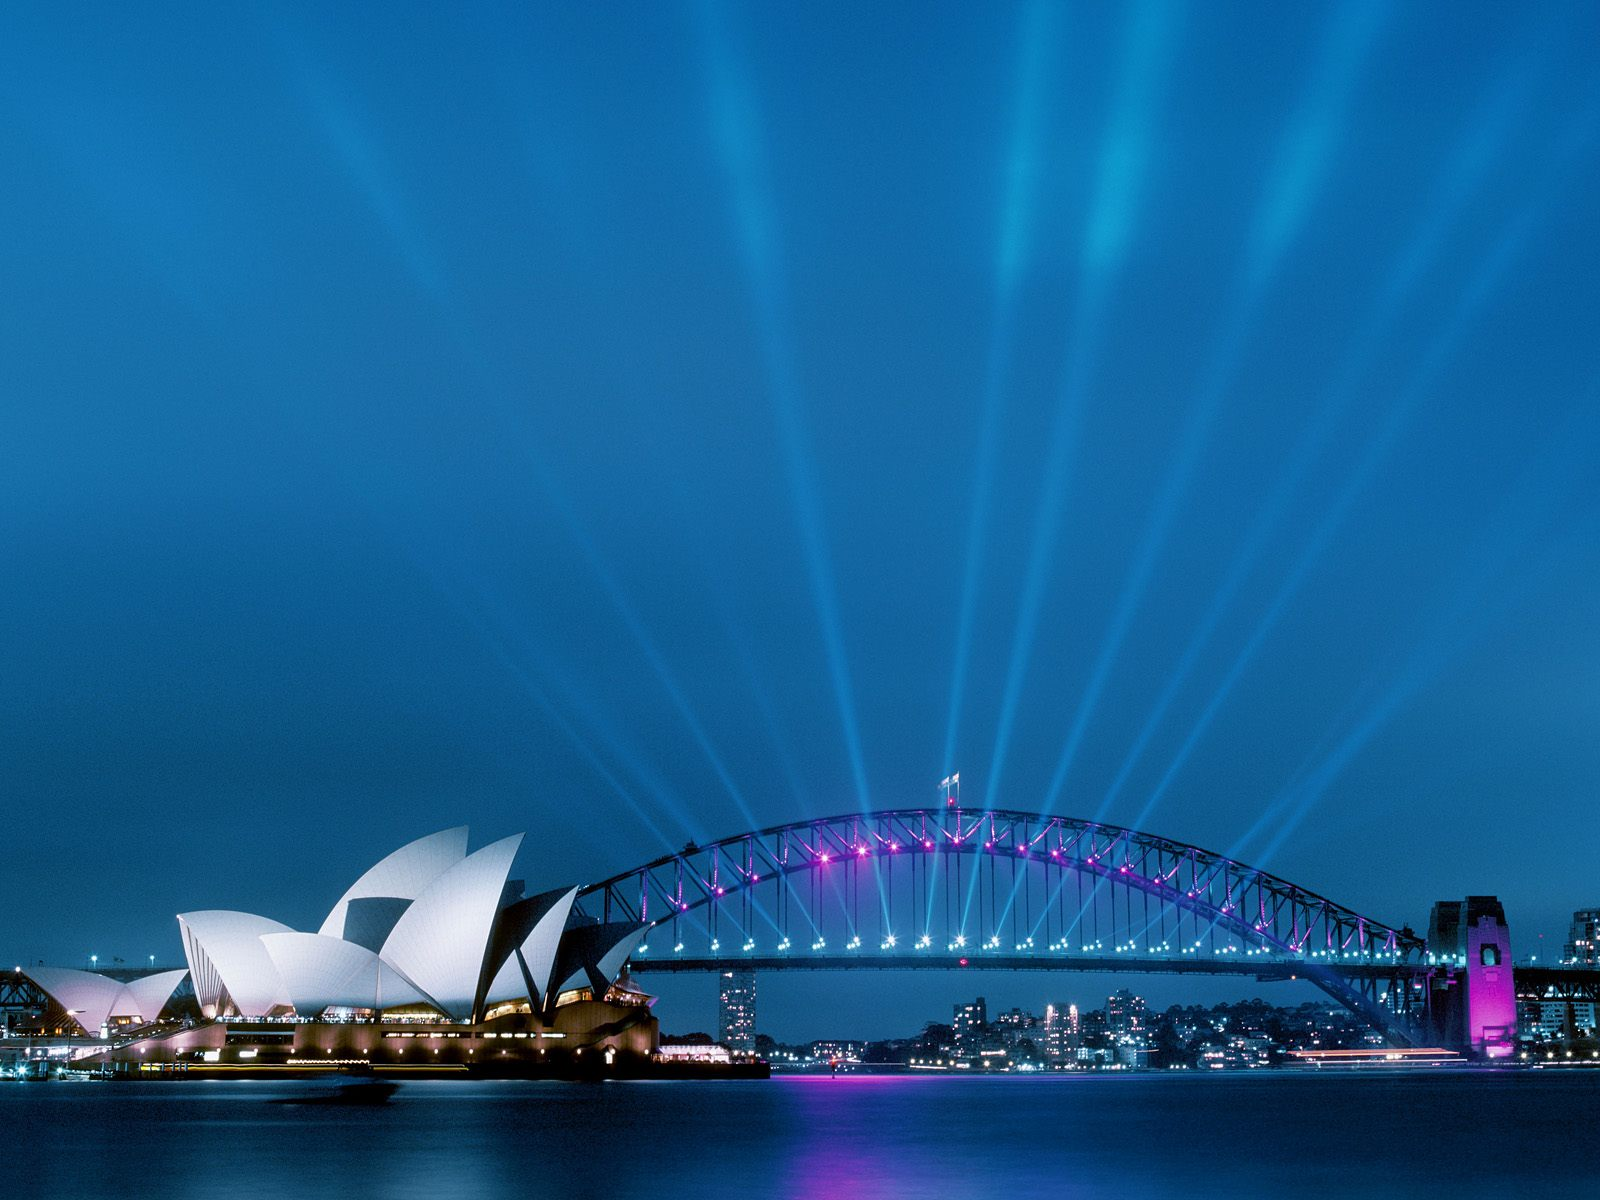 House and Harbour Bridge   Australia Wallpaper 23340467 1600x1200